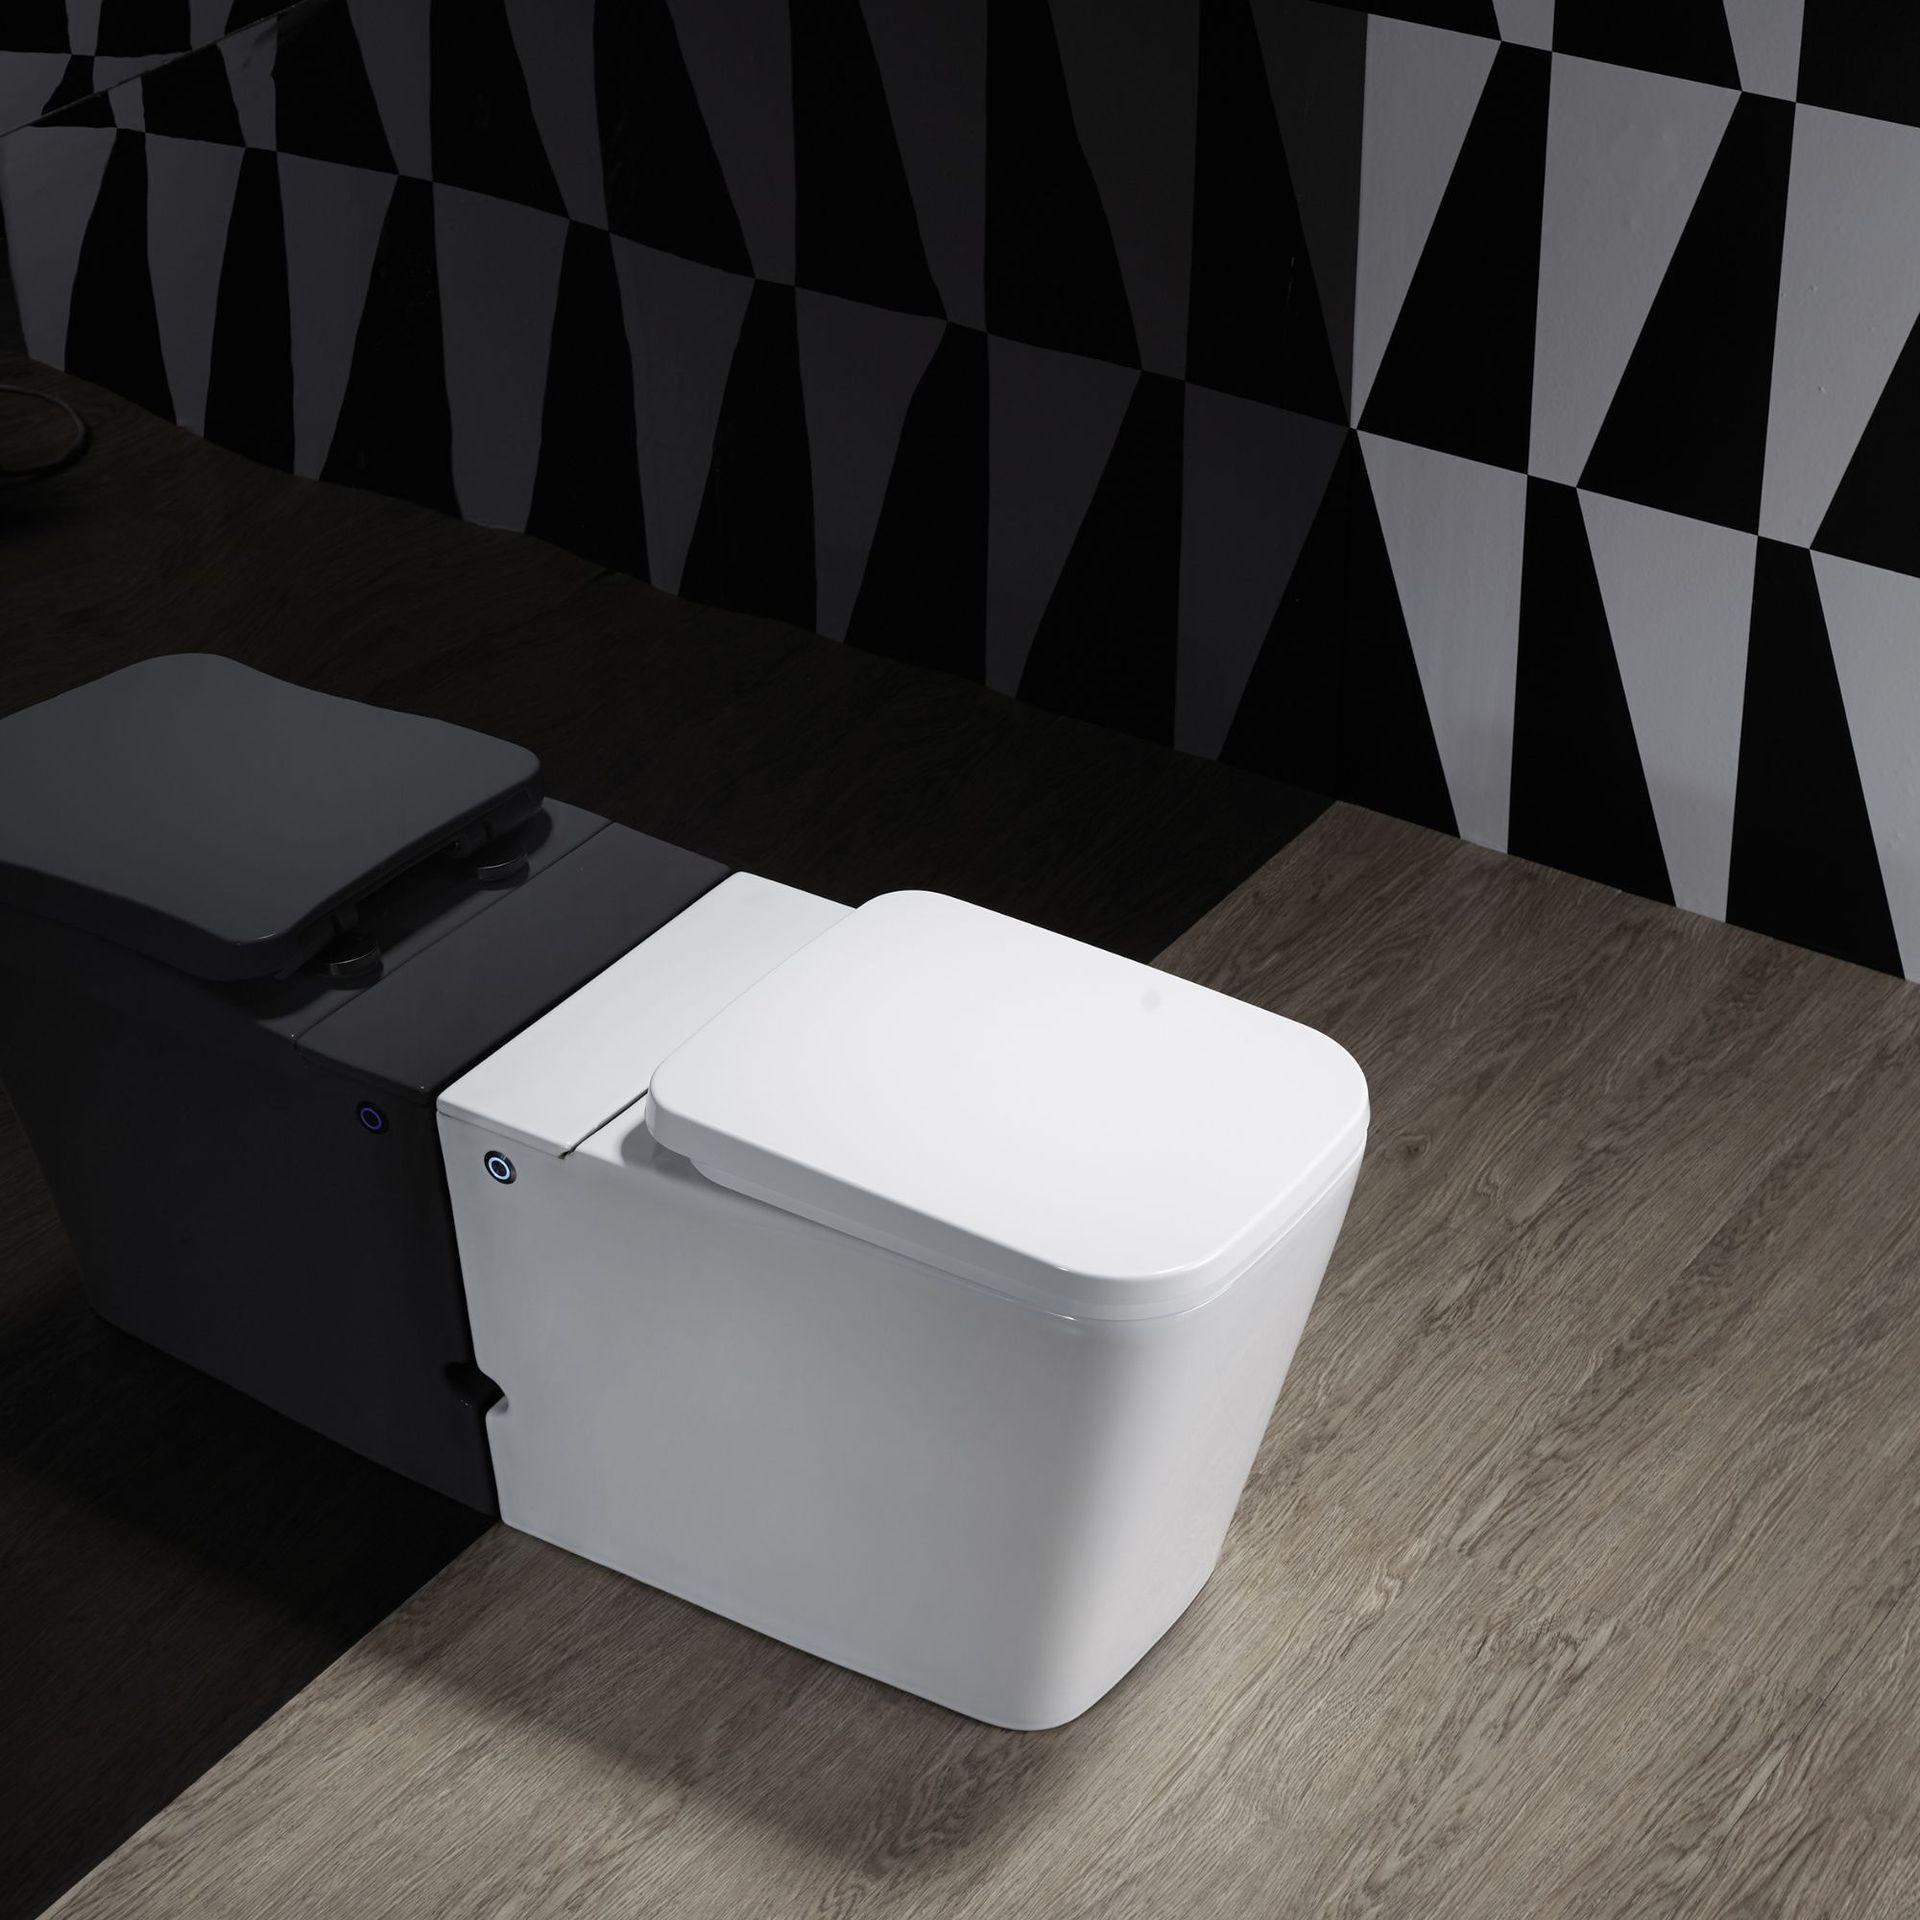 Spot wholesale ceramic toilets household small apartment large caliber no tank pulse toilet